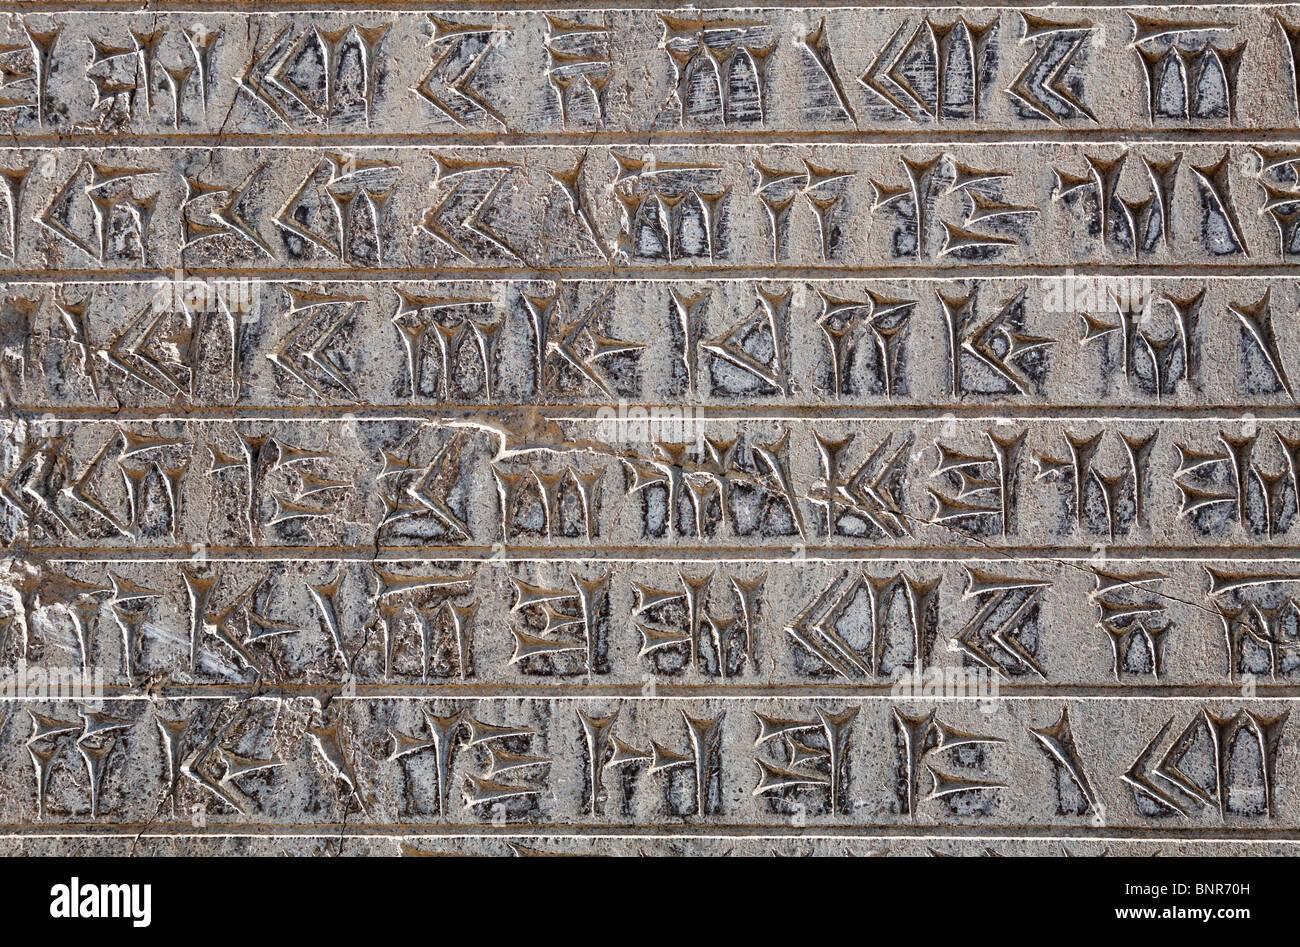 Irán - Persepolis - Carved cuneiforme Imagen De Stock